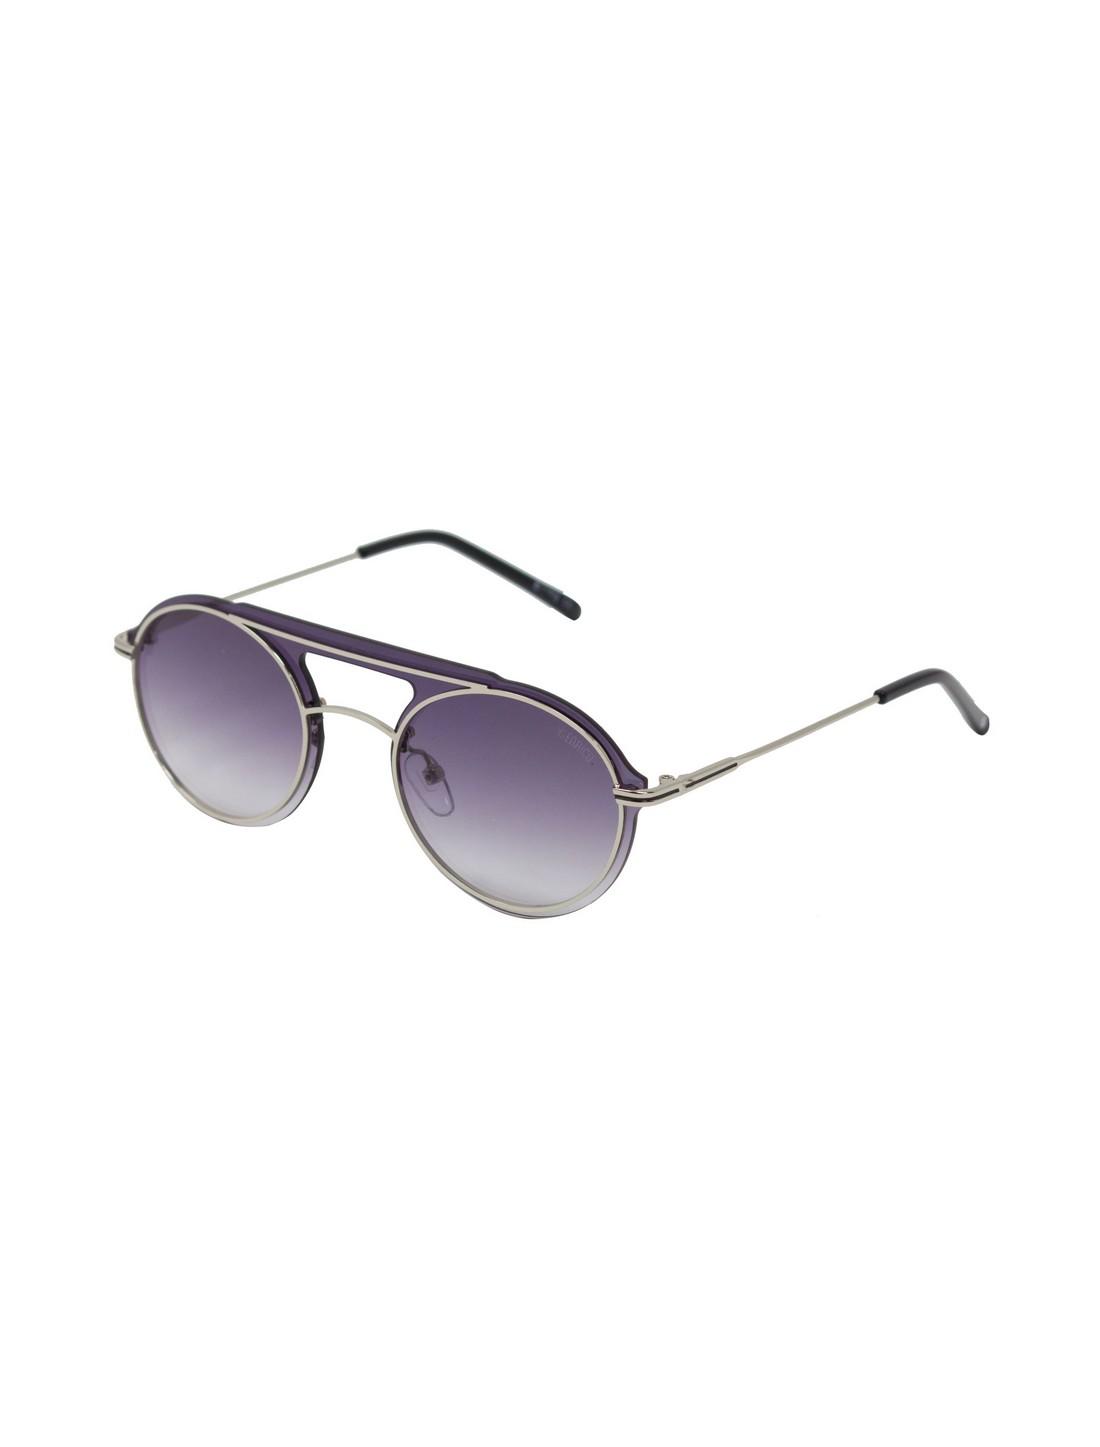 ENRICO | ENRICO Stargazer UV Protected Round Unisex Sunglasses ( Lens - Purple | Frame - Silver-Toned)